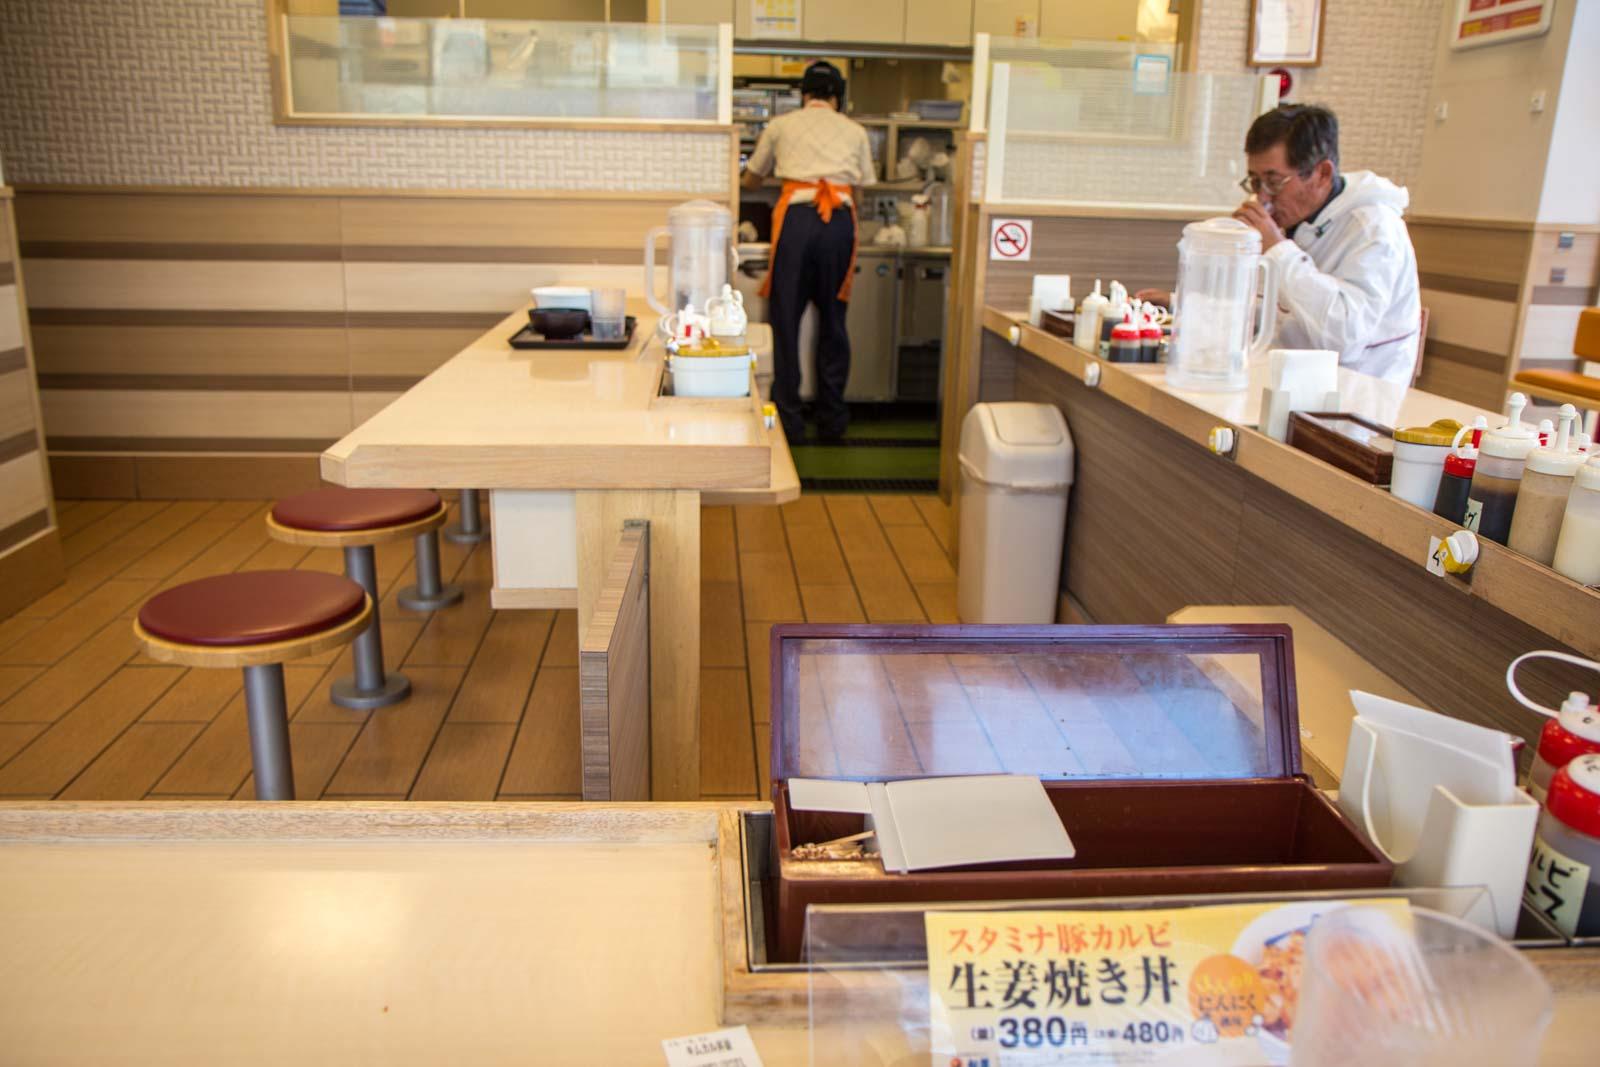 donburi, Japanese food, Japanese dishes, rice meals in Japan, Matsuya